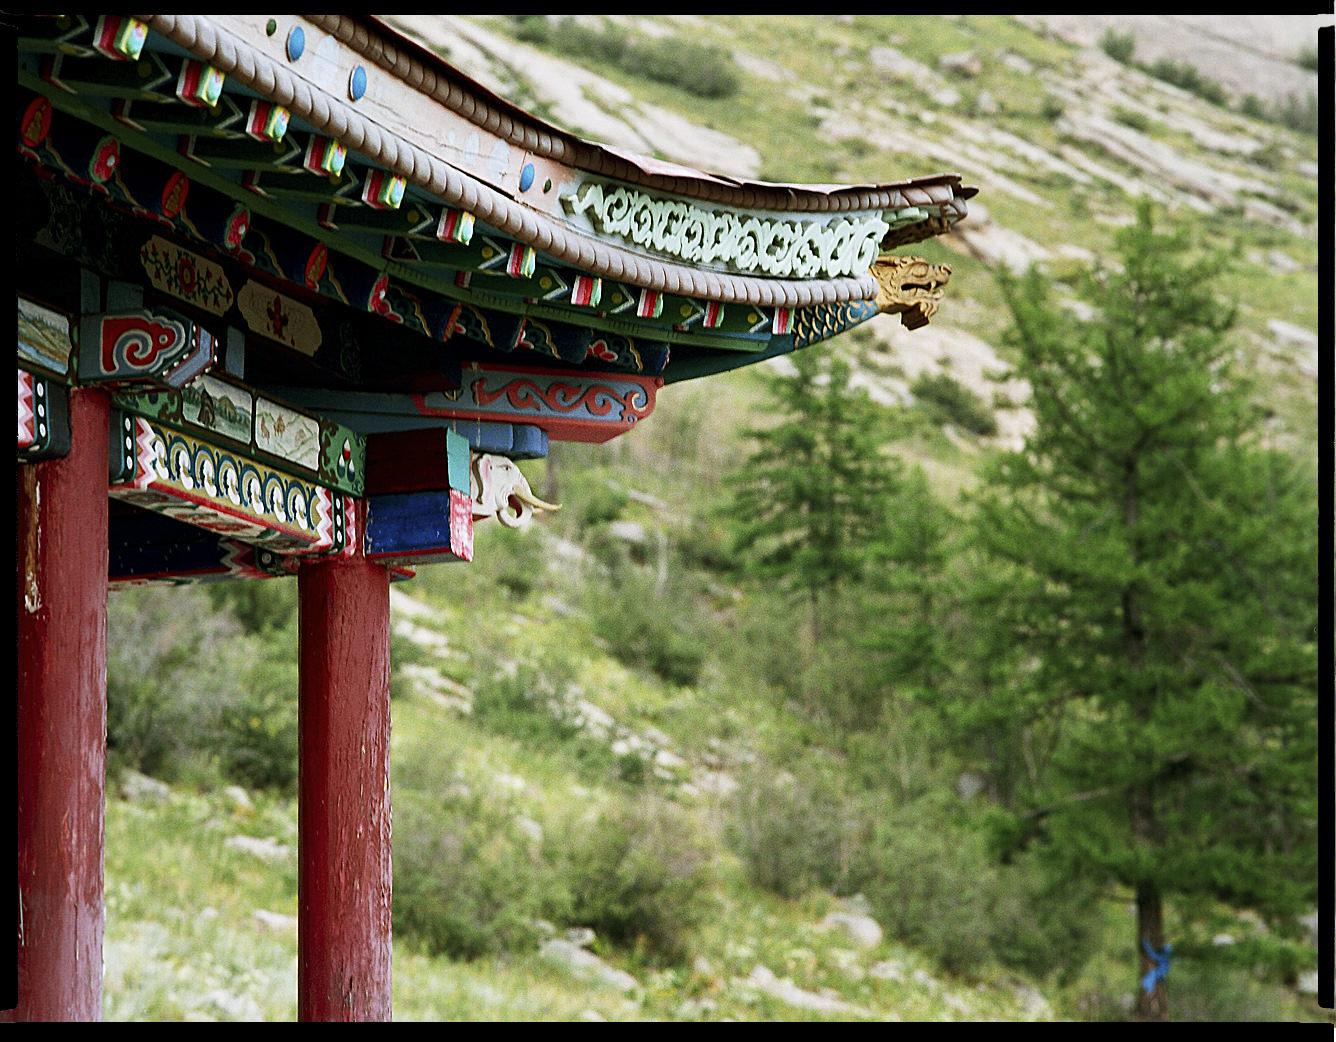 MediumFormatPatrikWallner_Mongolia_HillTempleLOWQ-1